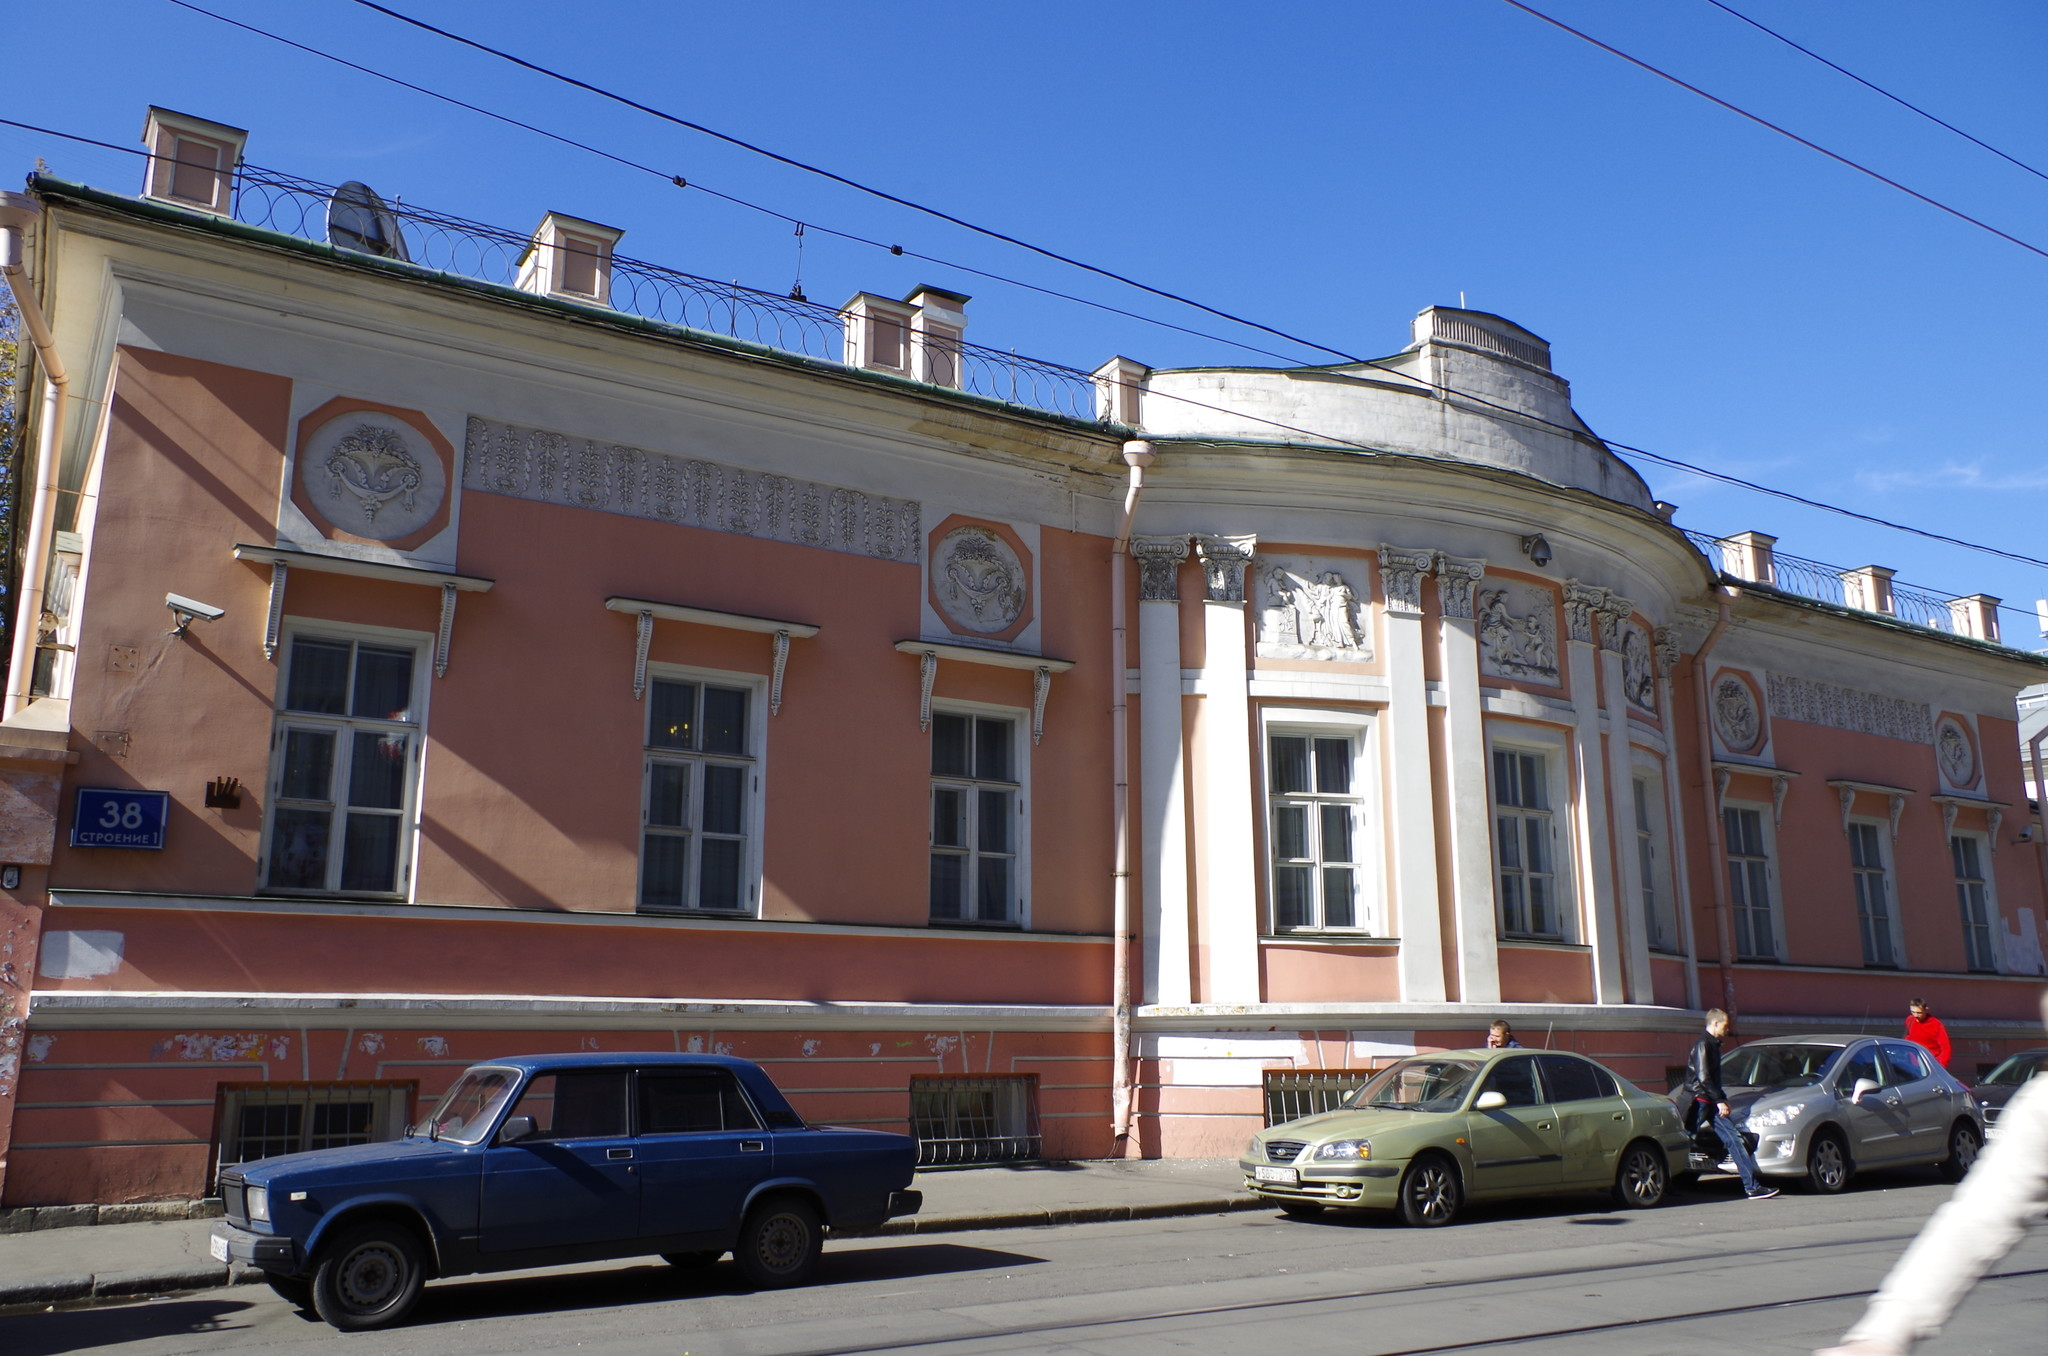 Дом Карабанова (Бауманская улица, дом 38)